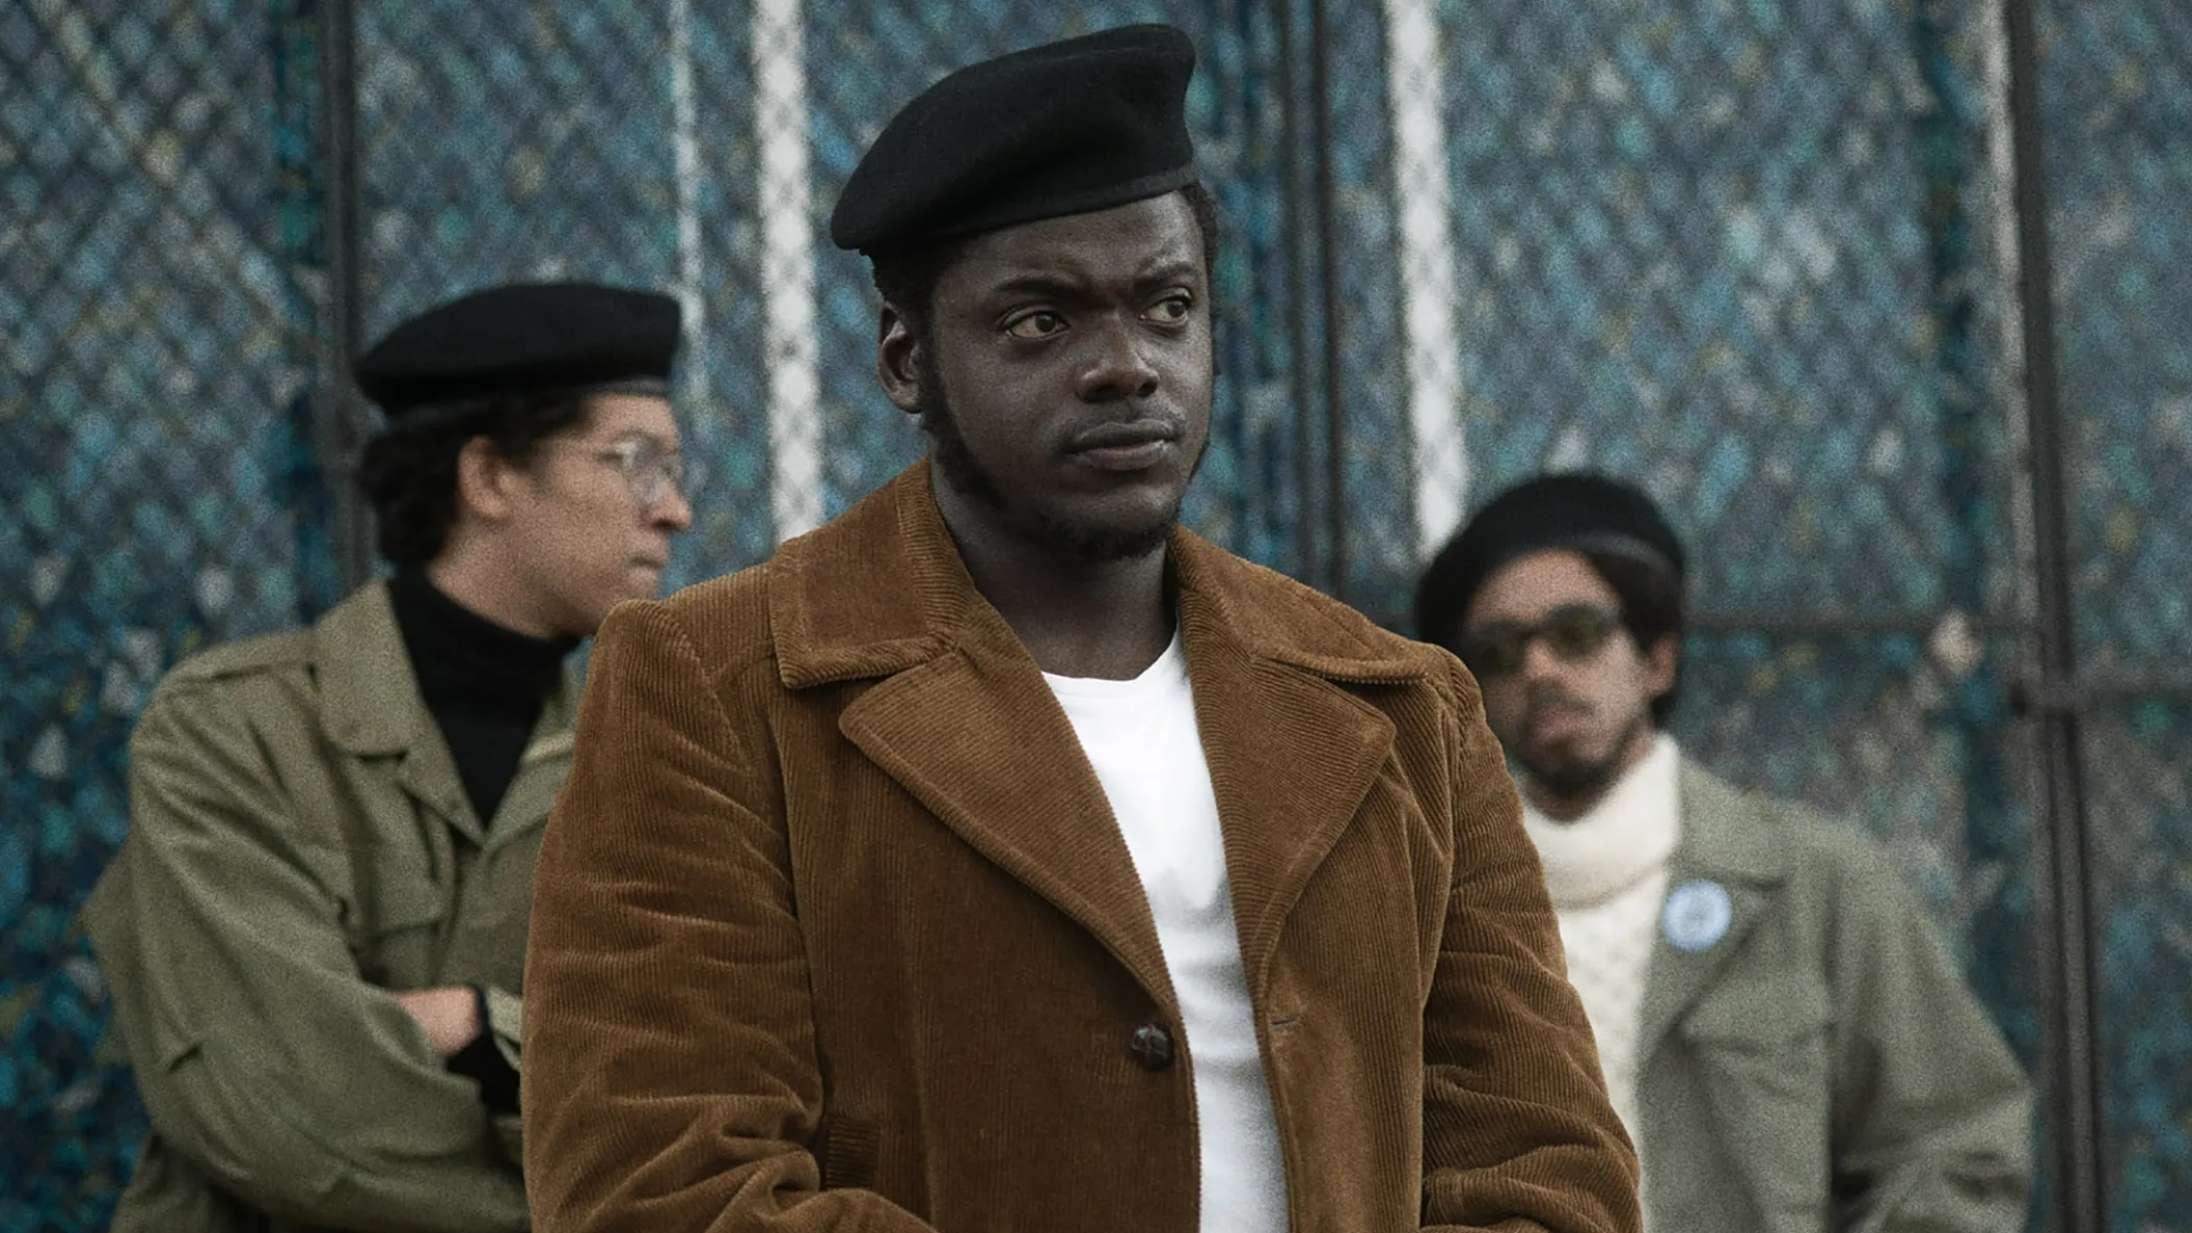 'Judas and the Black Messiah': Daniel Kaluuya og Lakeith Stanfield brillerer i Oscar-hypet film